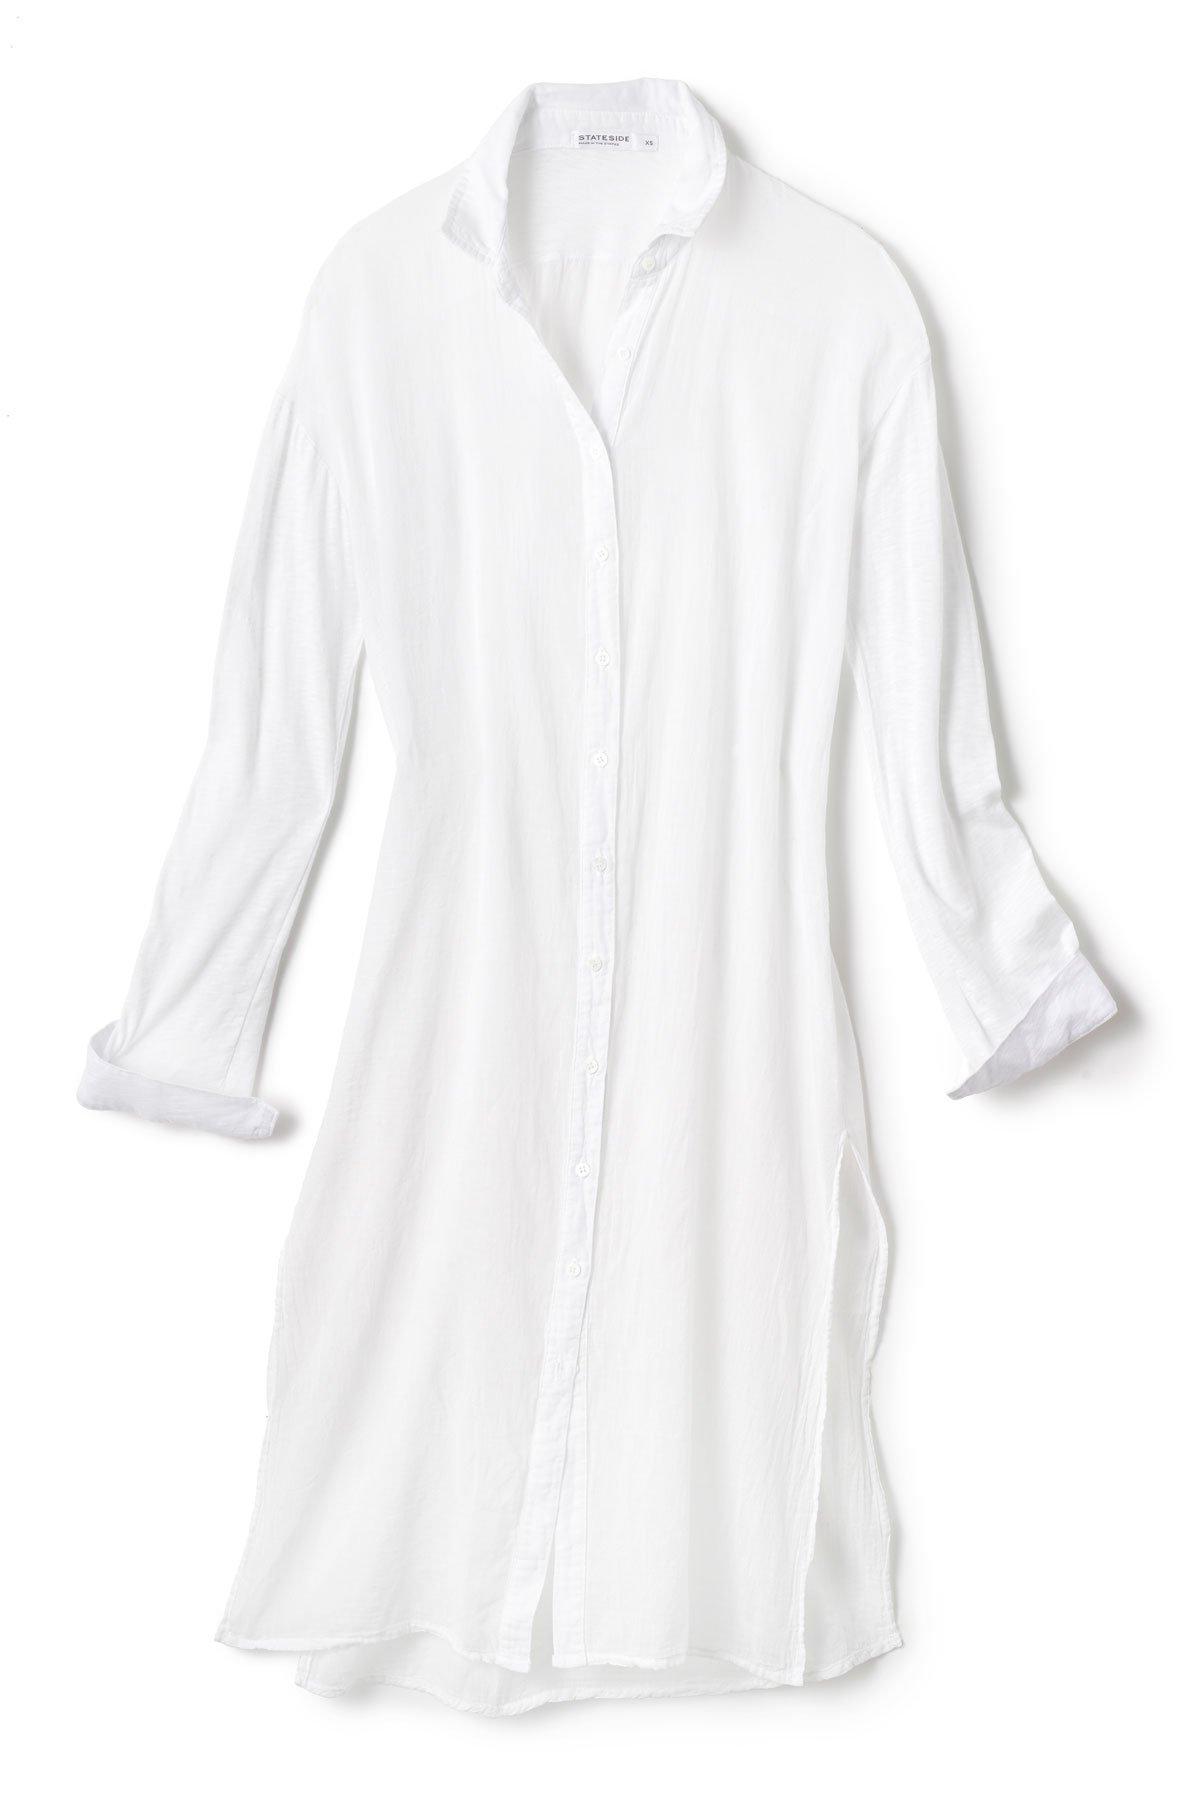 Stateside Women's Cottons Shirt Dress Swim Cover Up White M by Stateside (Image #4)